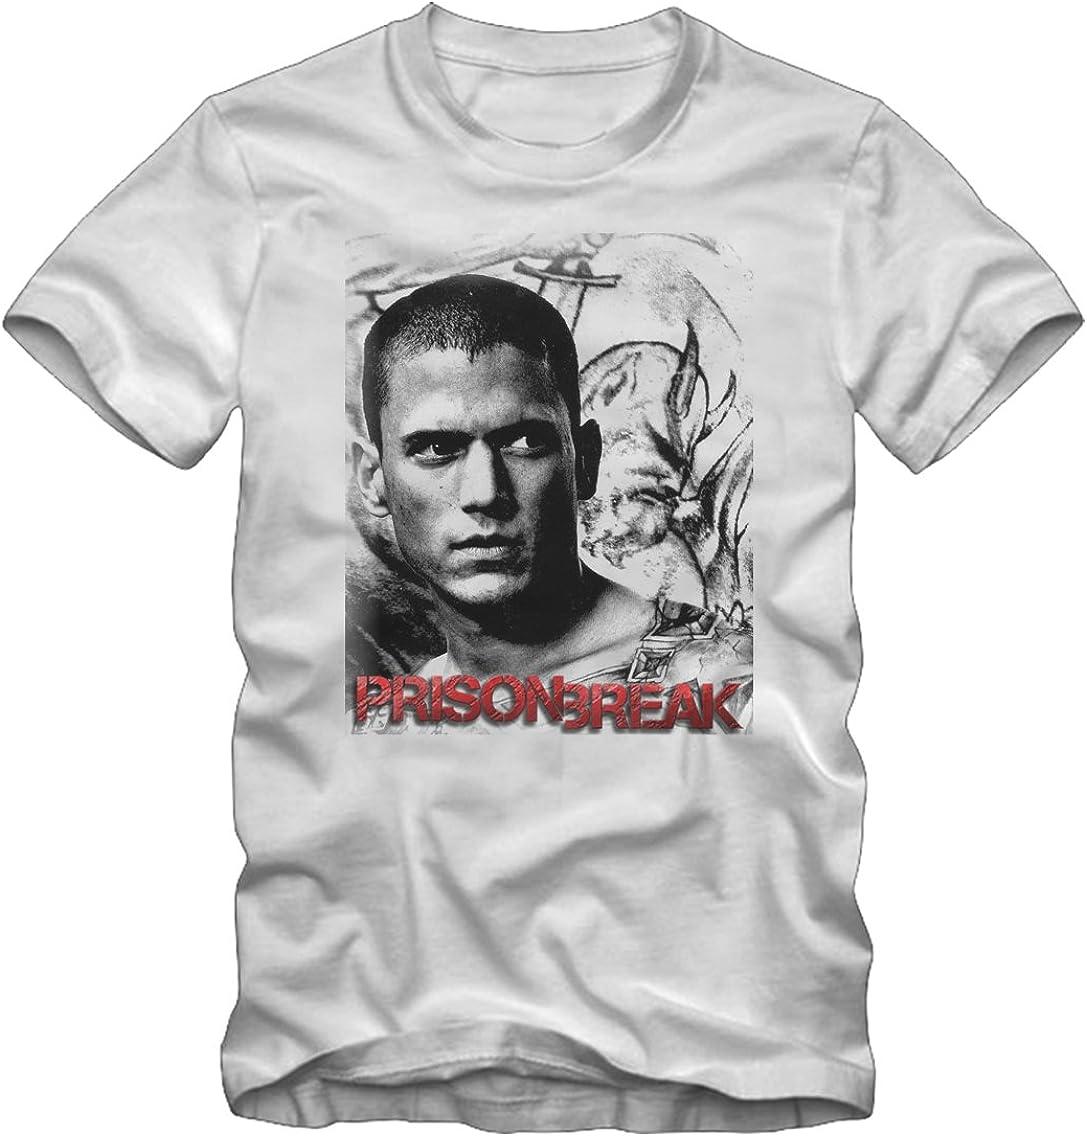 Bisura T-Shirt Prison Break Serie TV